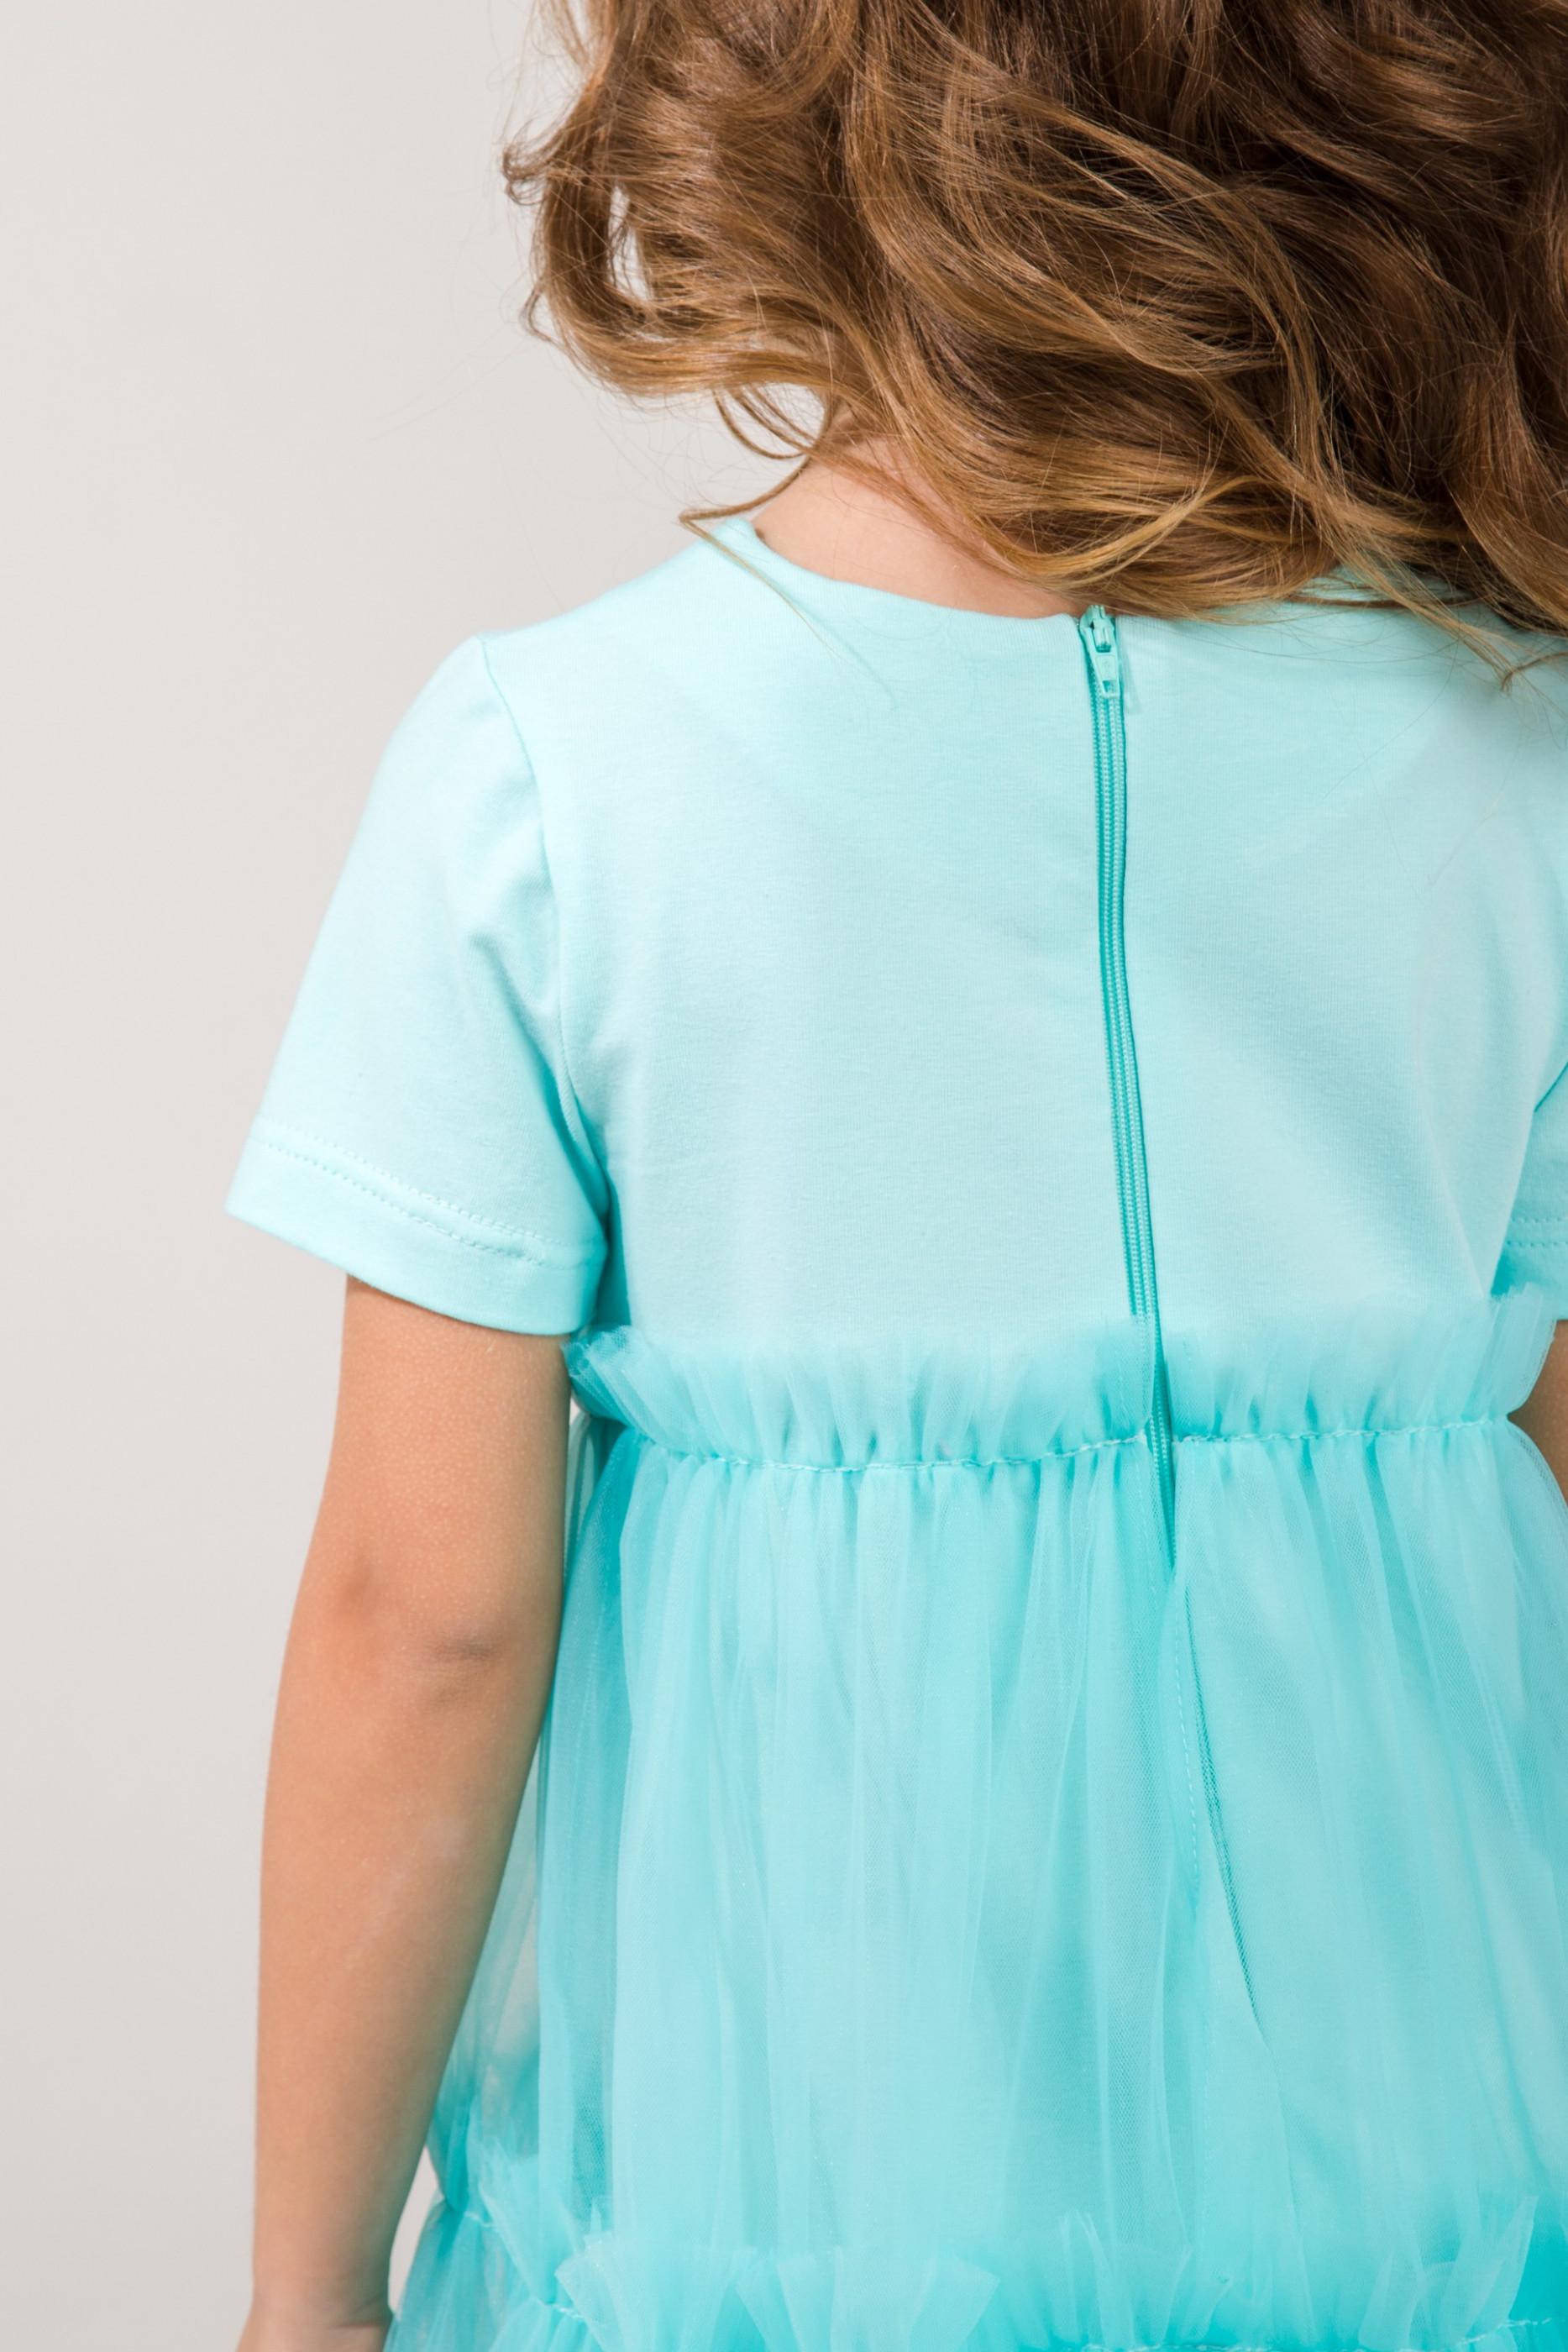 Плаття Шелбі, фото №3